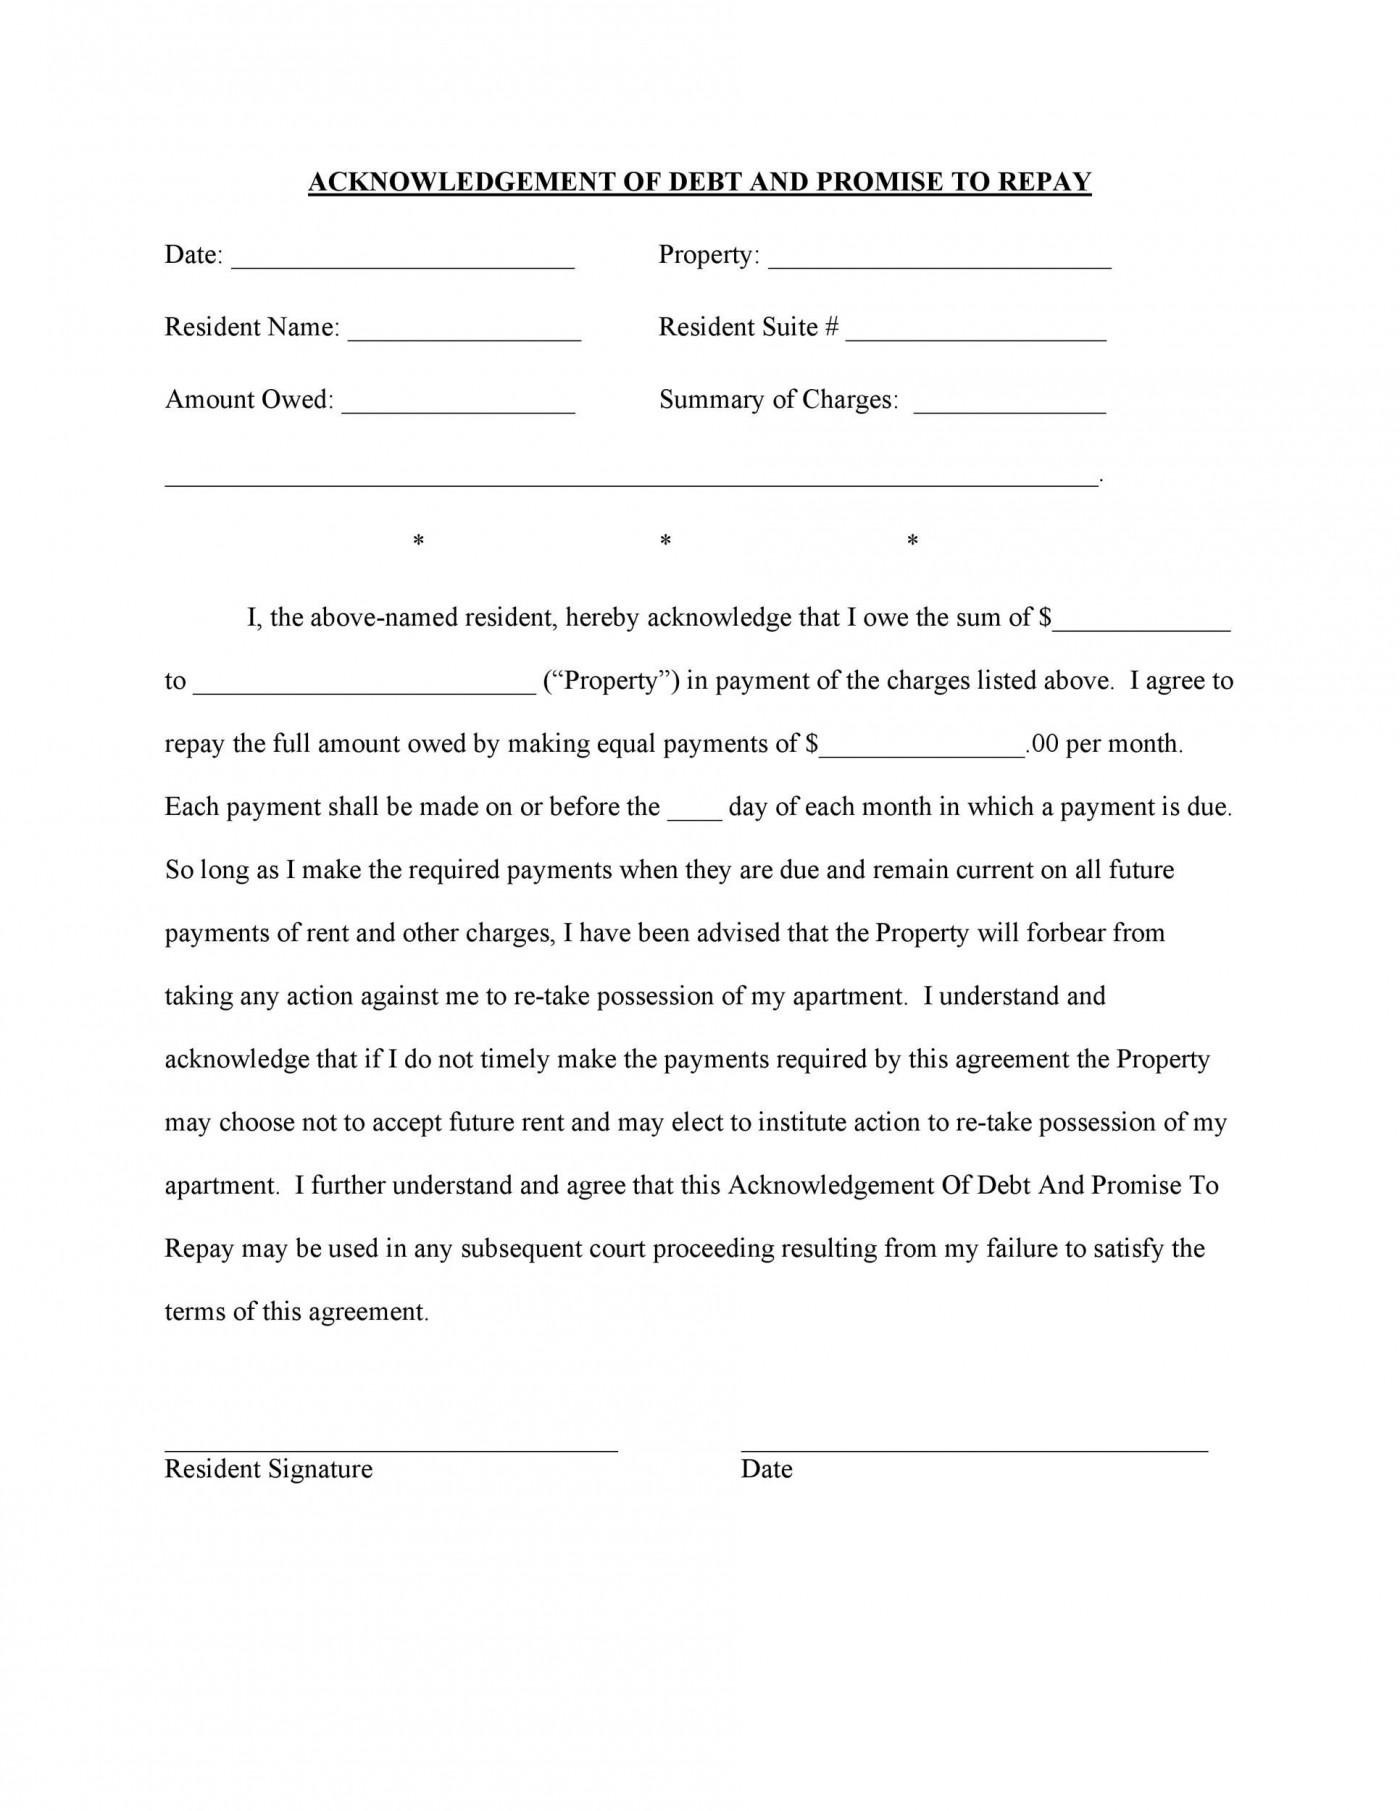 008 Unforgettable Free Family Loan Agreement Template Nz Idea 1400